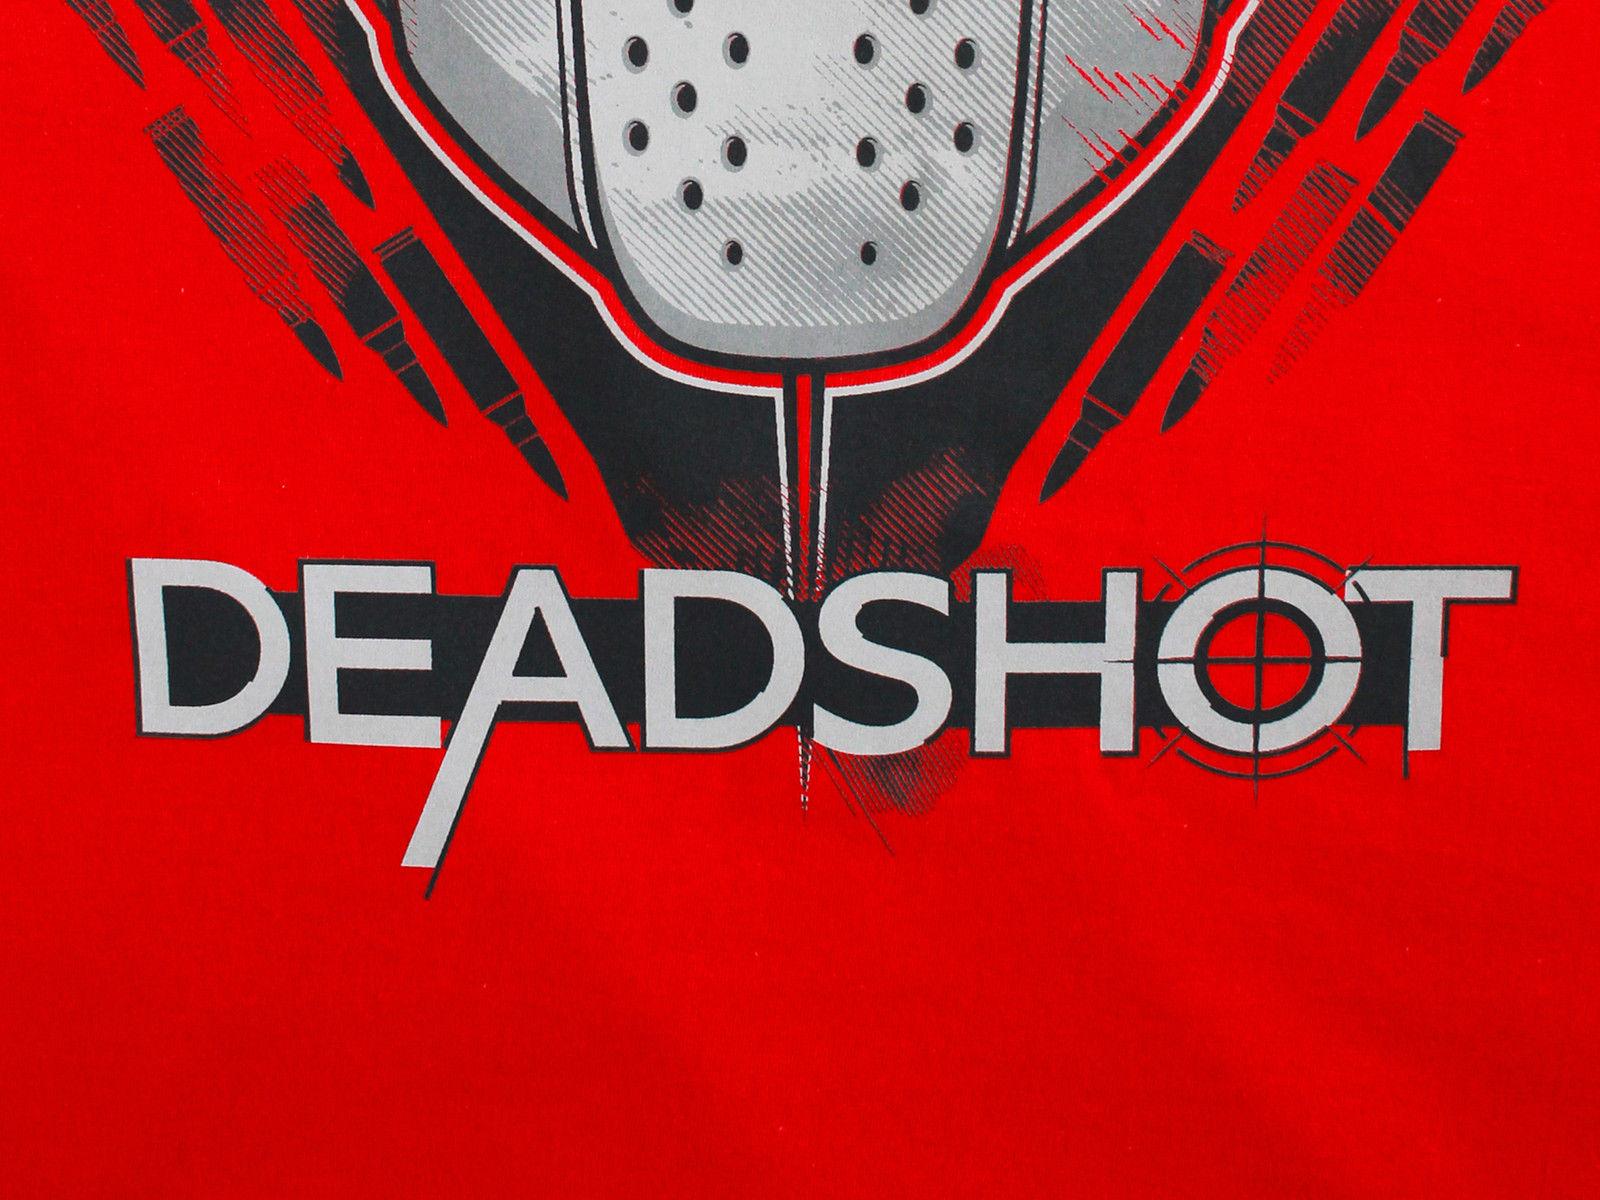 Deadshot Logo, Hd Wallpapers & backgrounds Download.